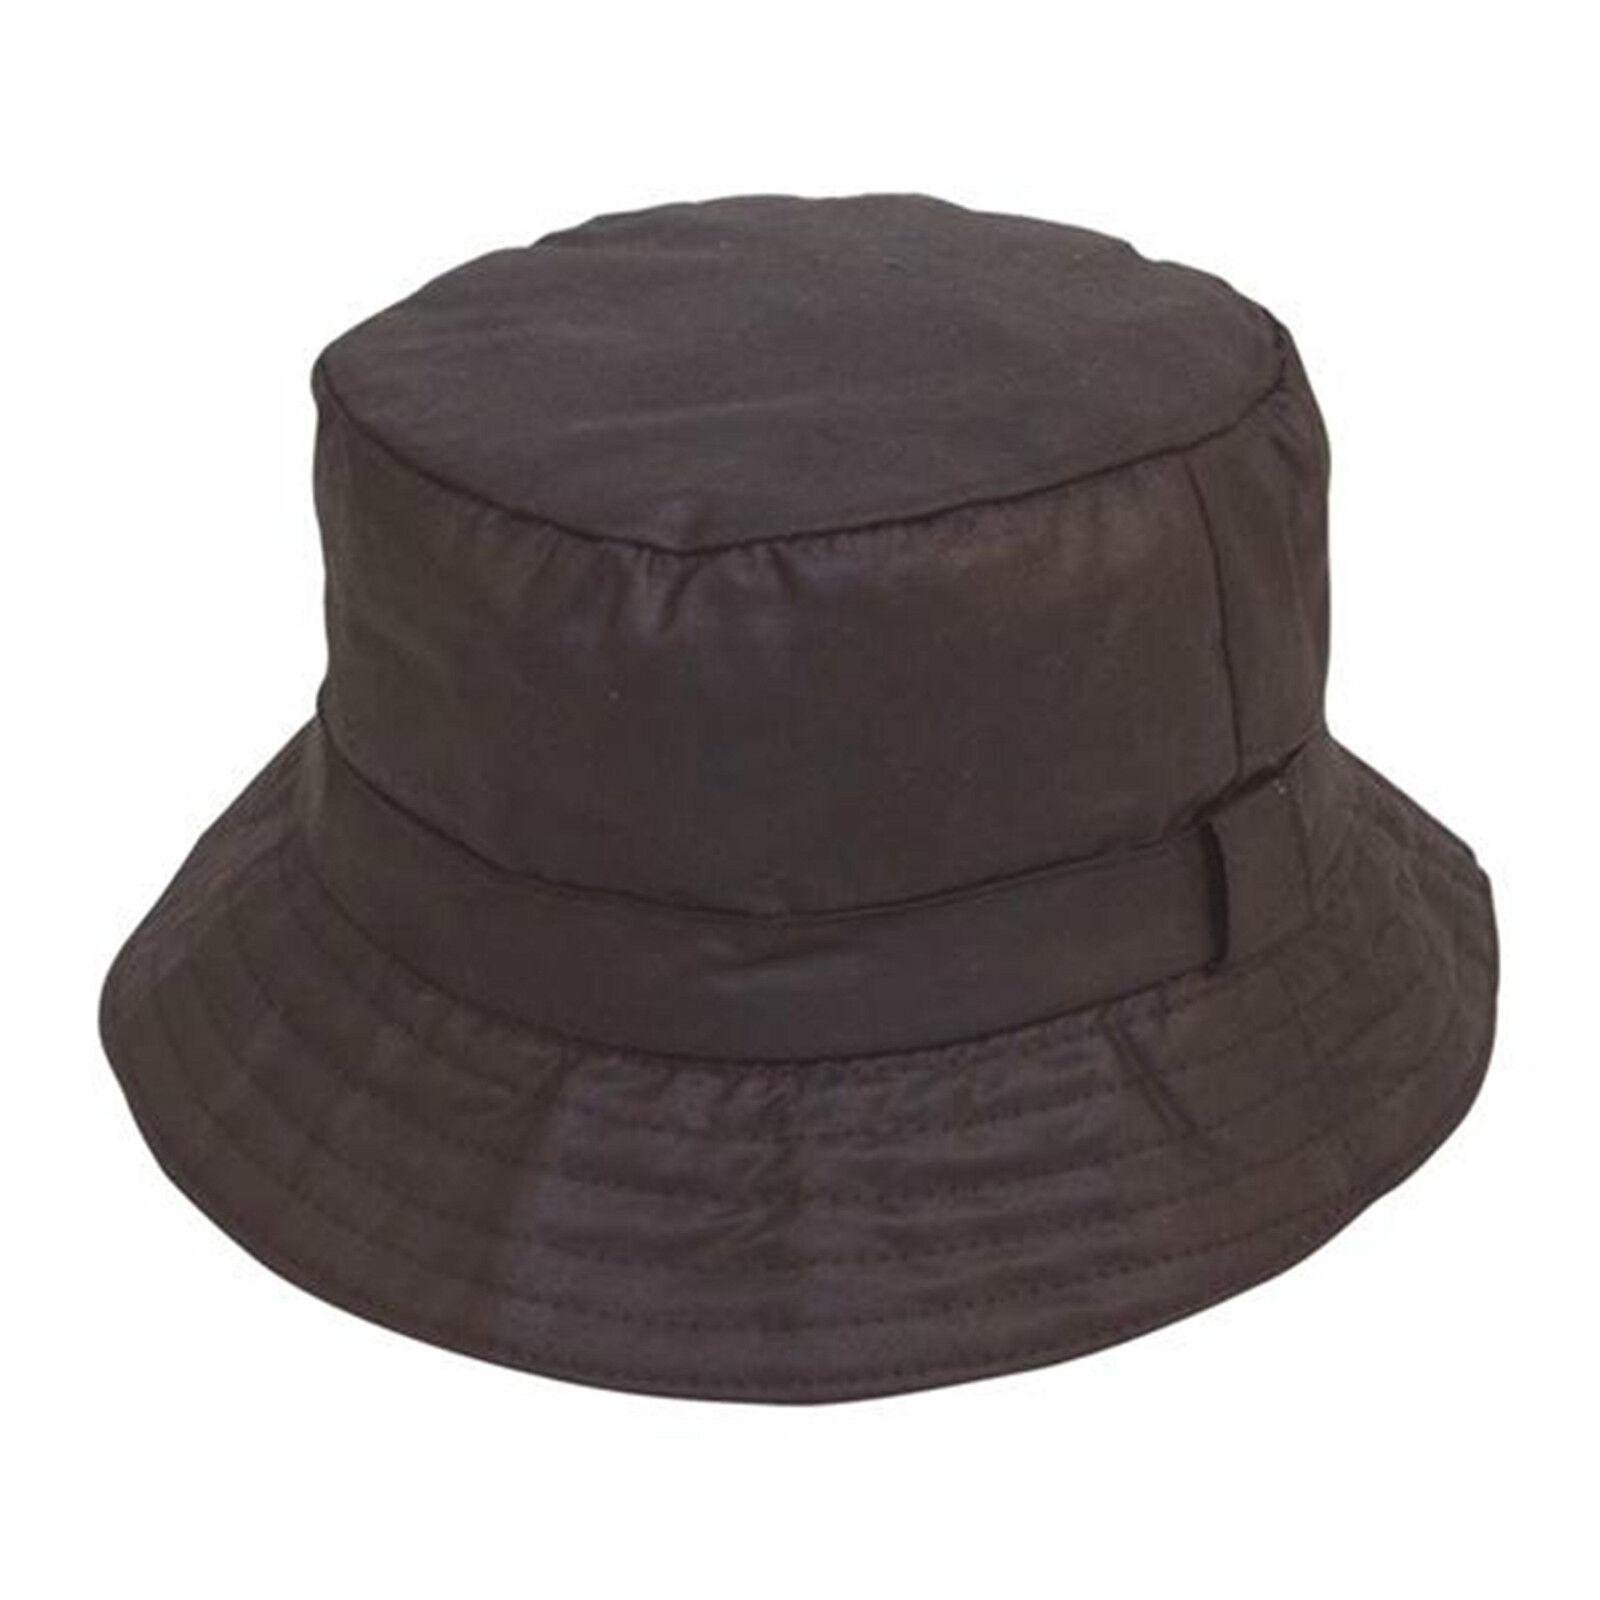 Details about Unisex Adult Quality Black Waxed Cotton Boonie Bush Wax  Bucket Hat 4ddcf368d68